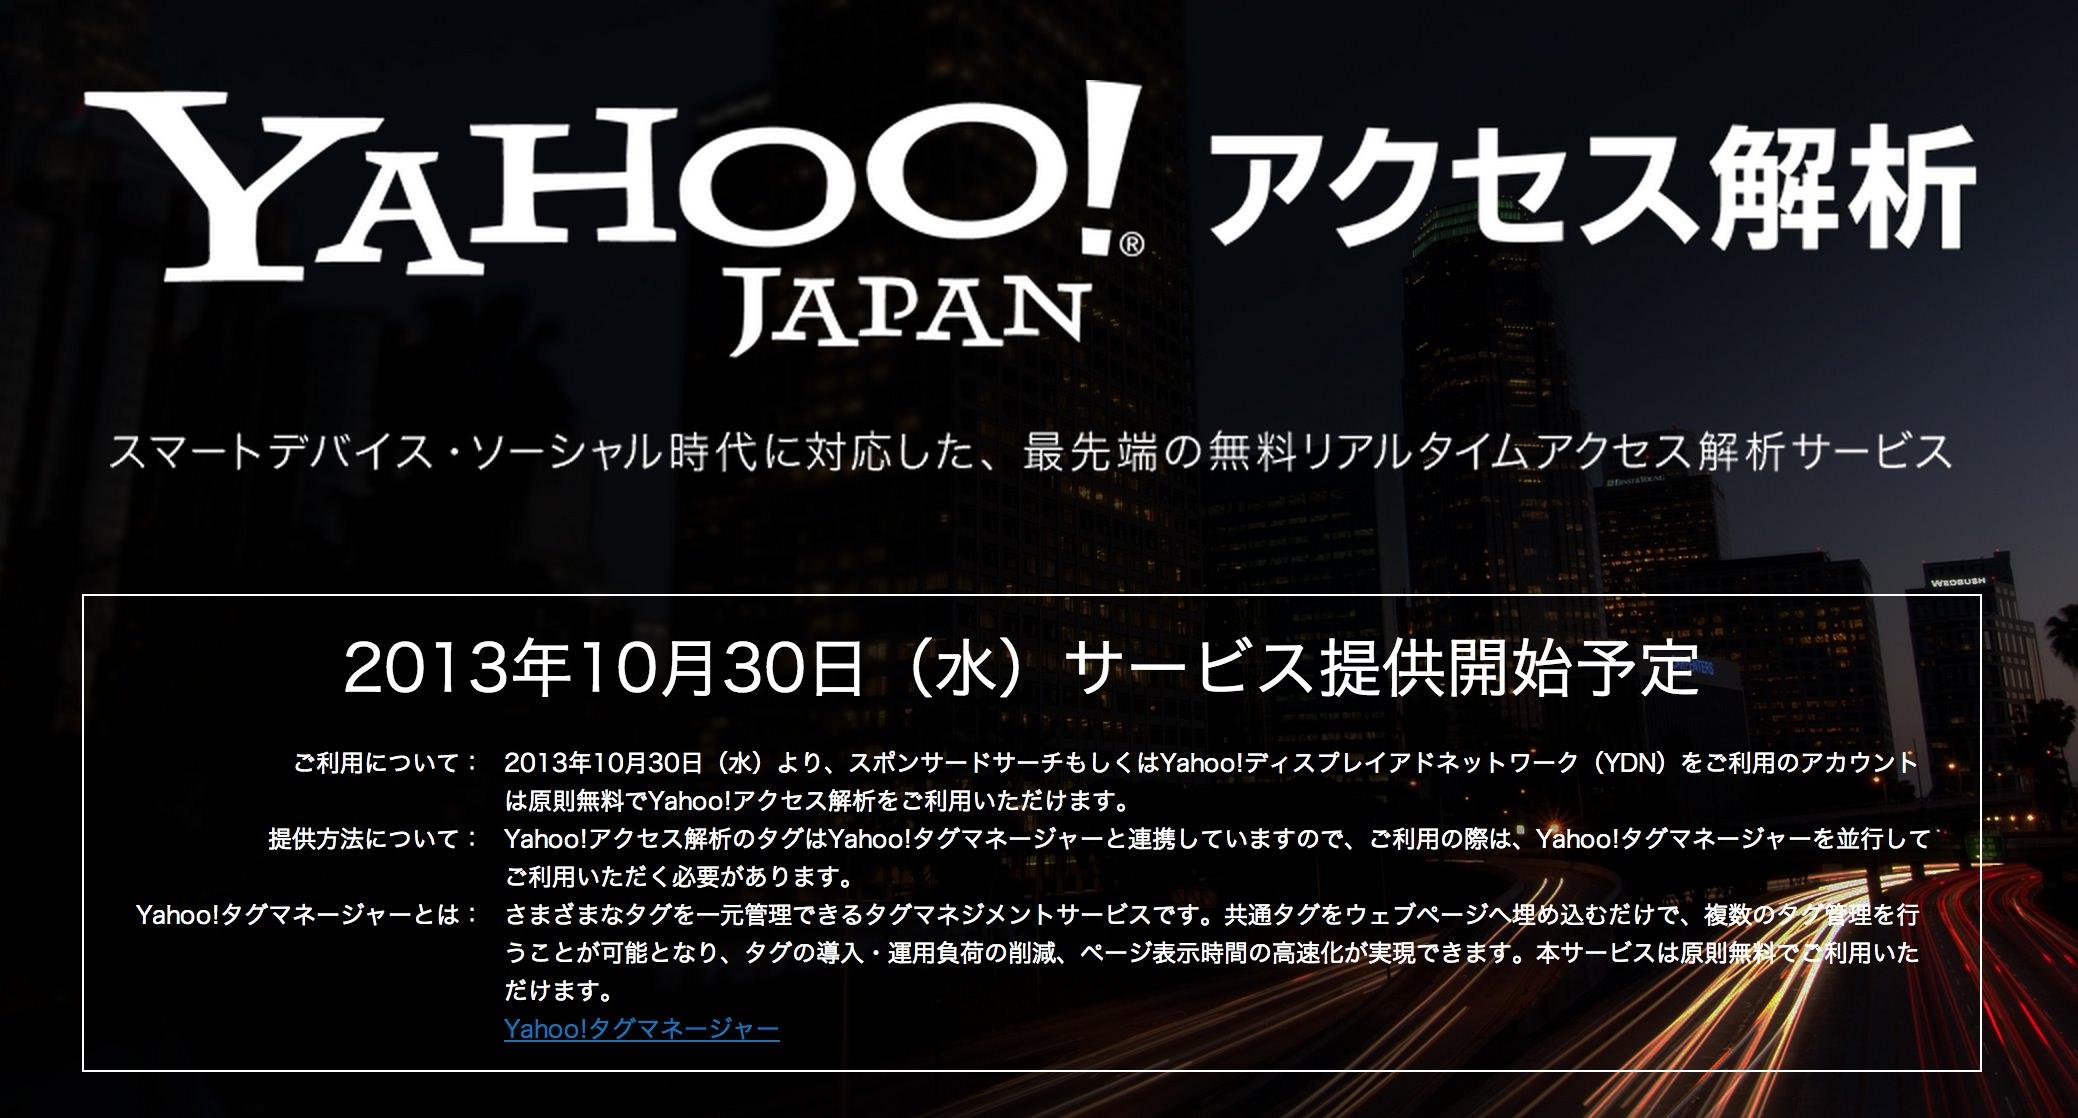 Yahoo!アクセス解析とYahoo!タグマネージャーの利用条件は? 広告利用者 or 代理店だけ?